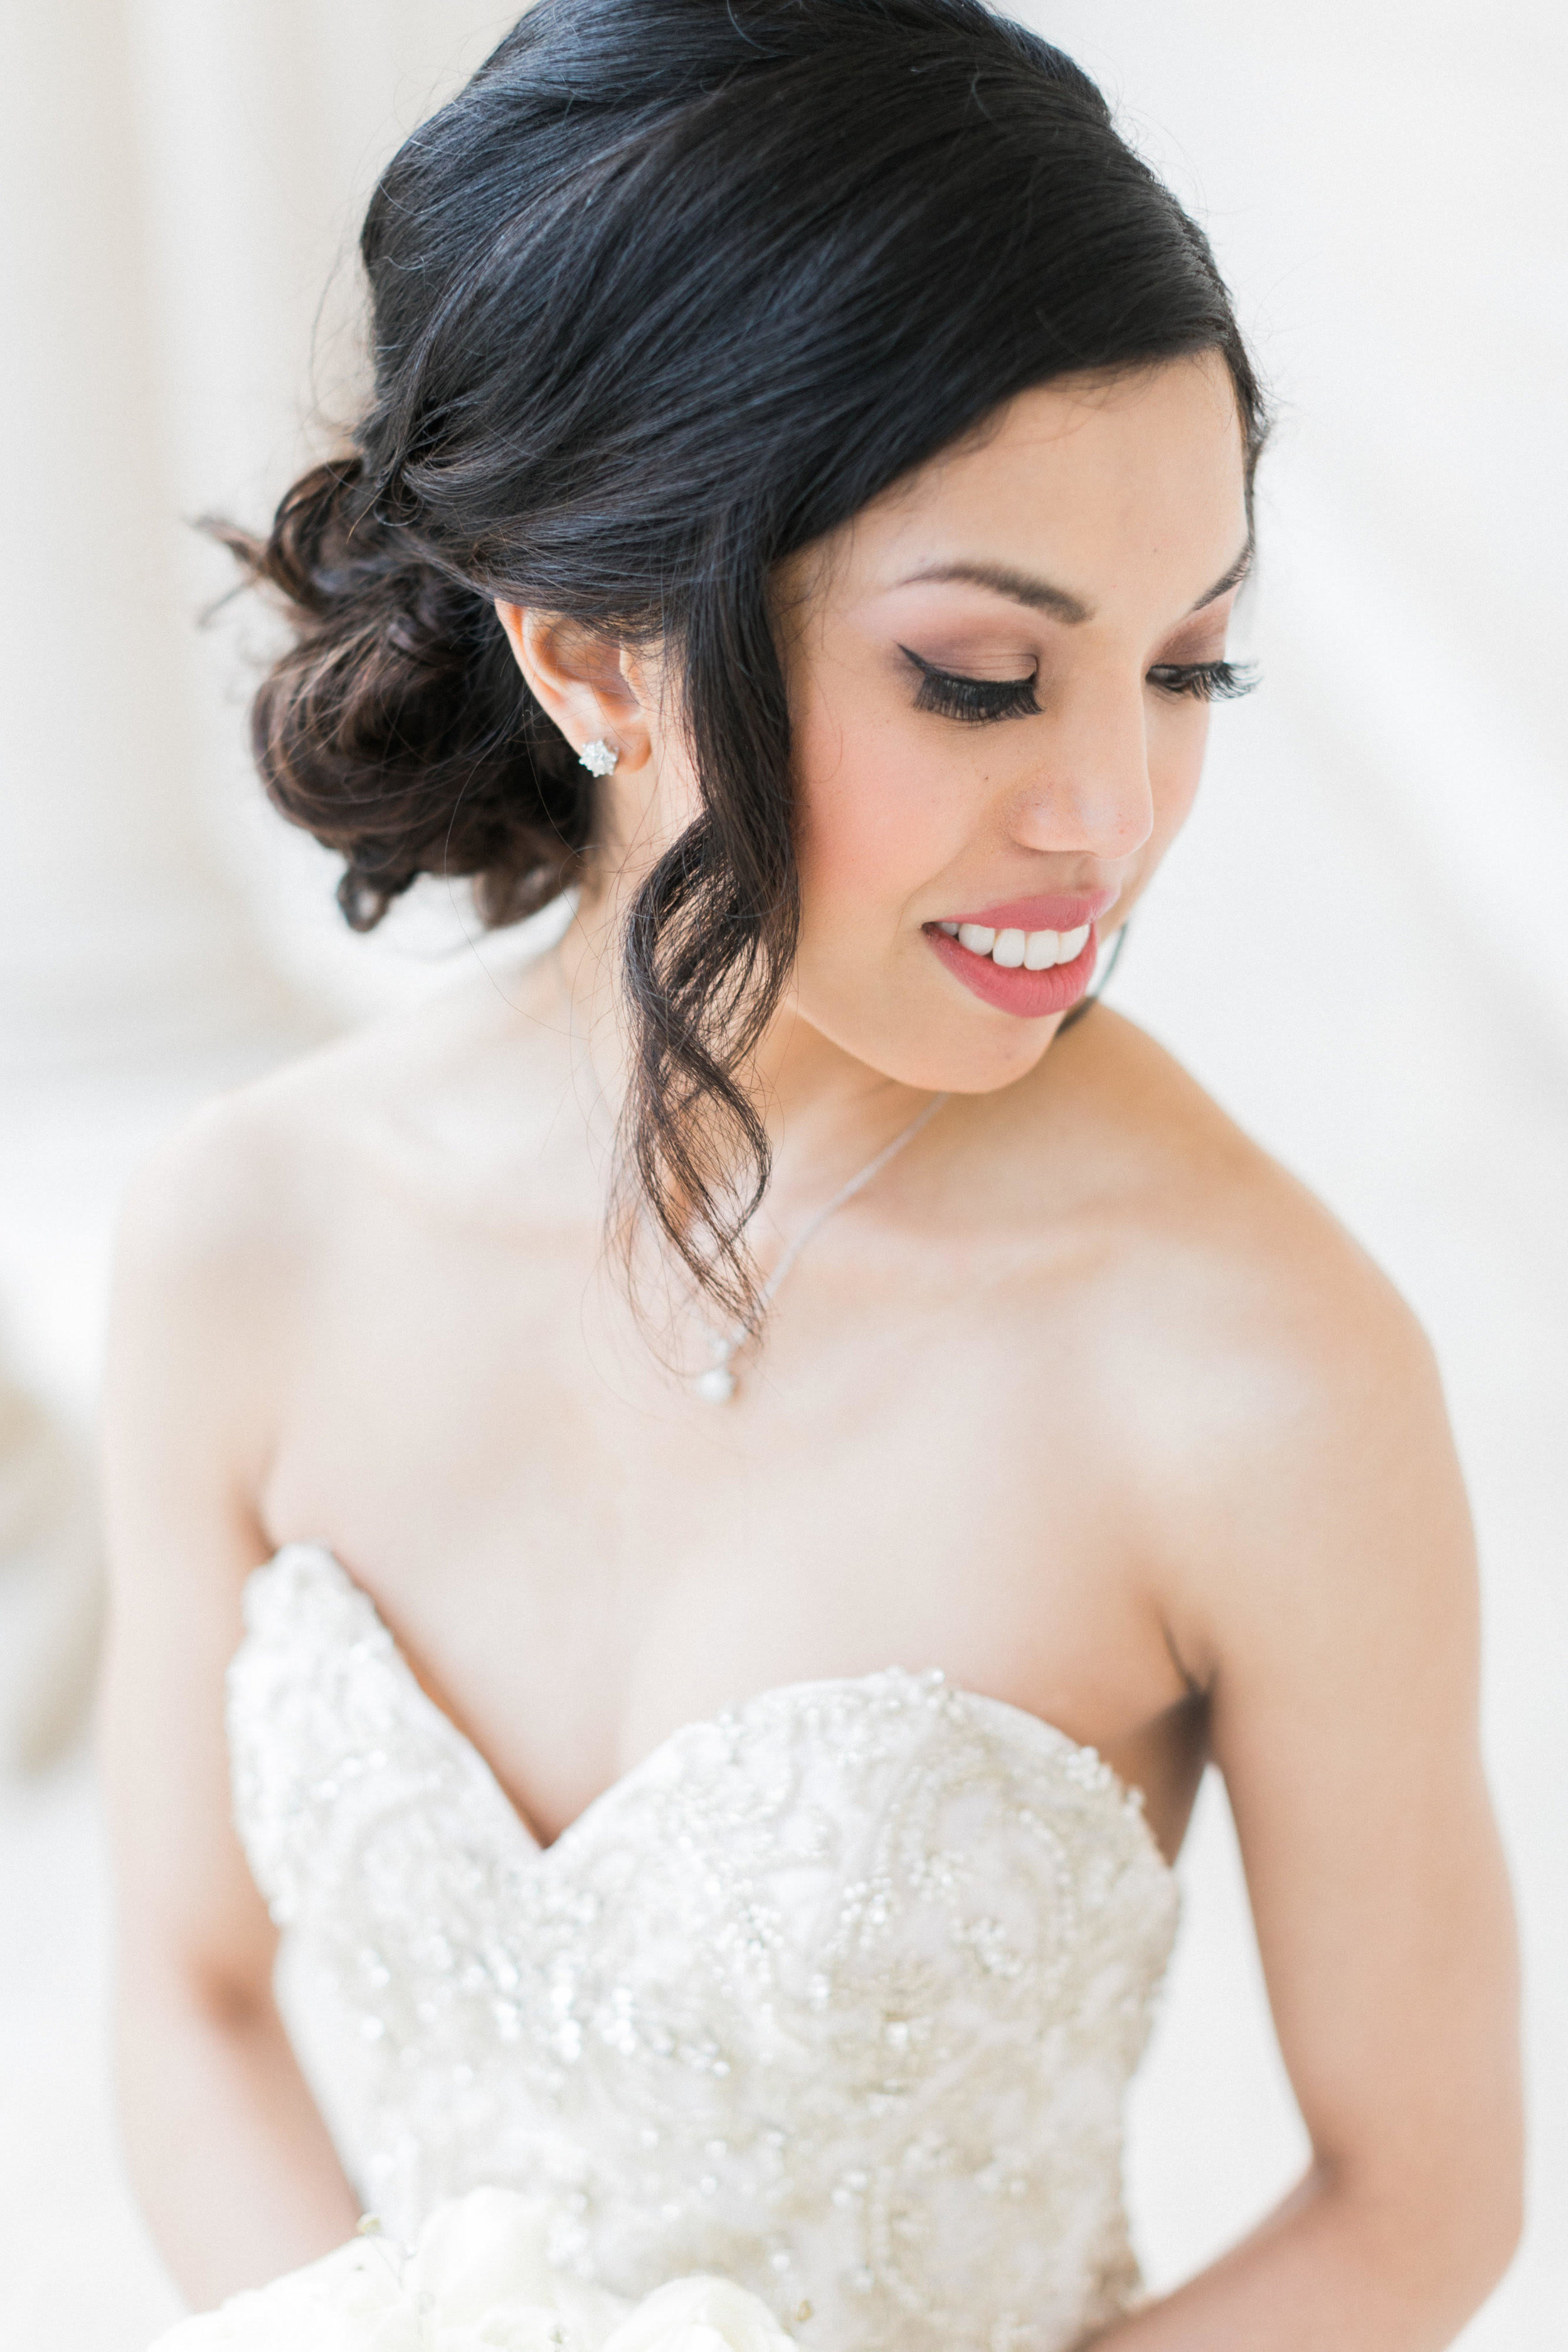 maria-lee-makeup-hair-wedding-sf_karen.jpg